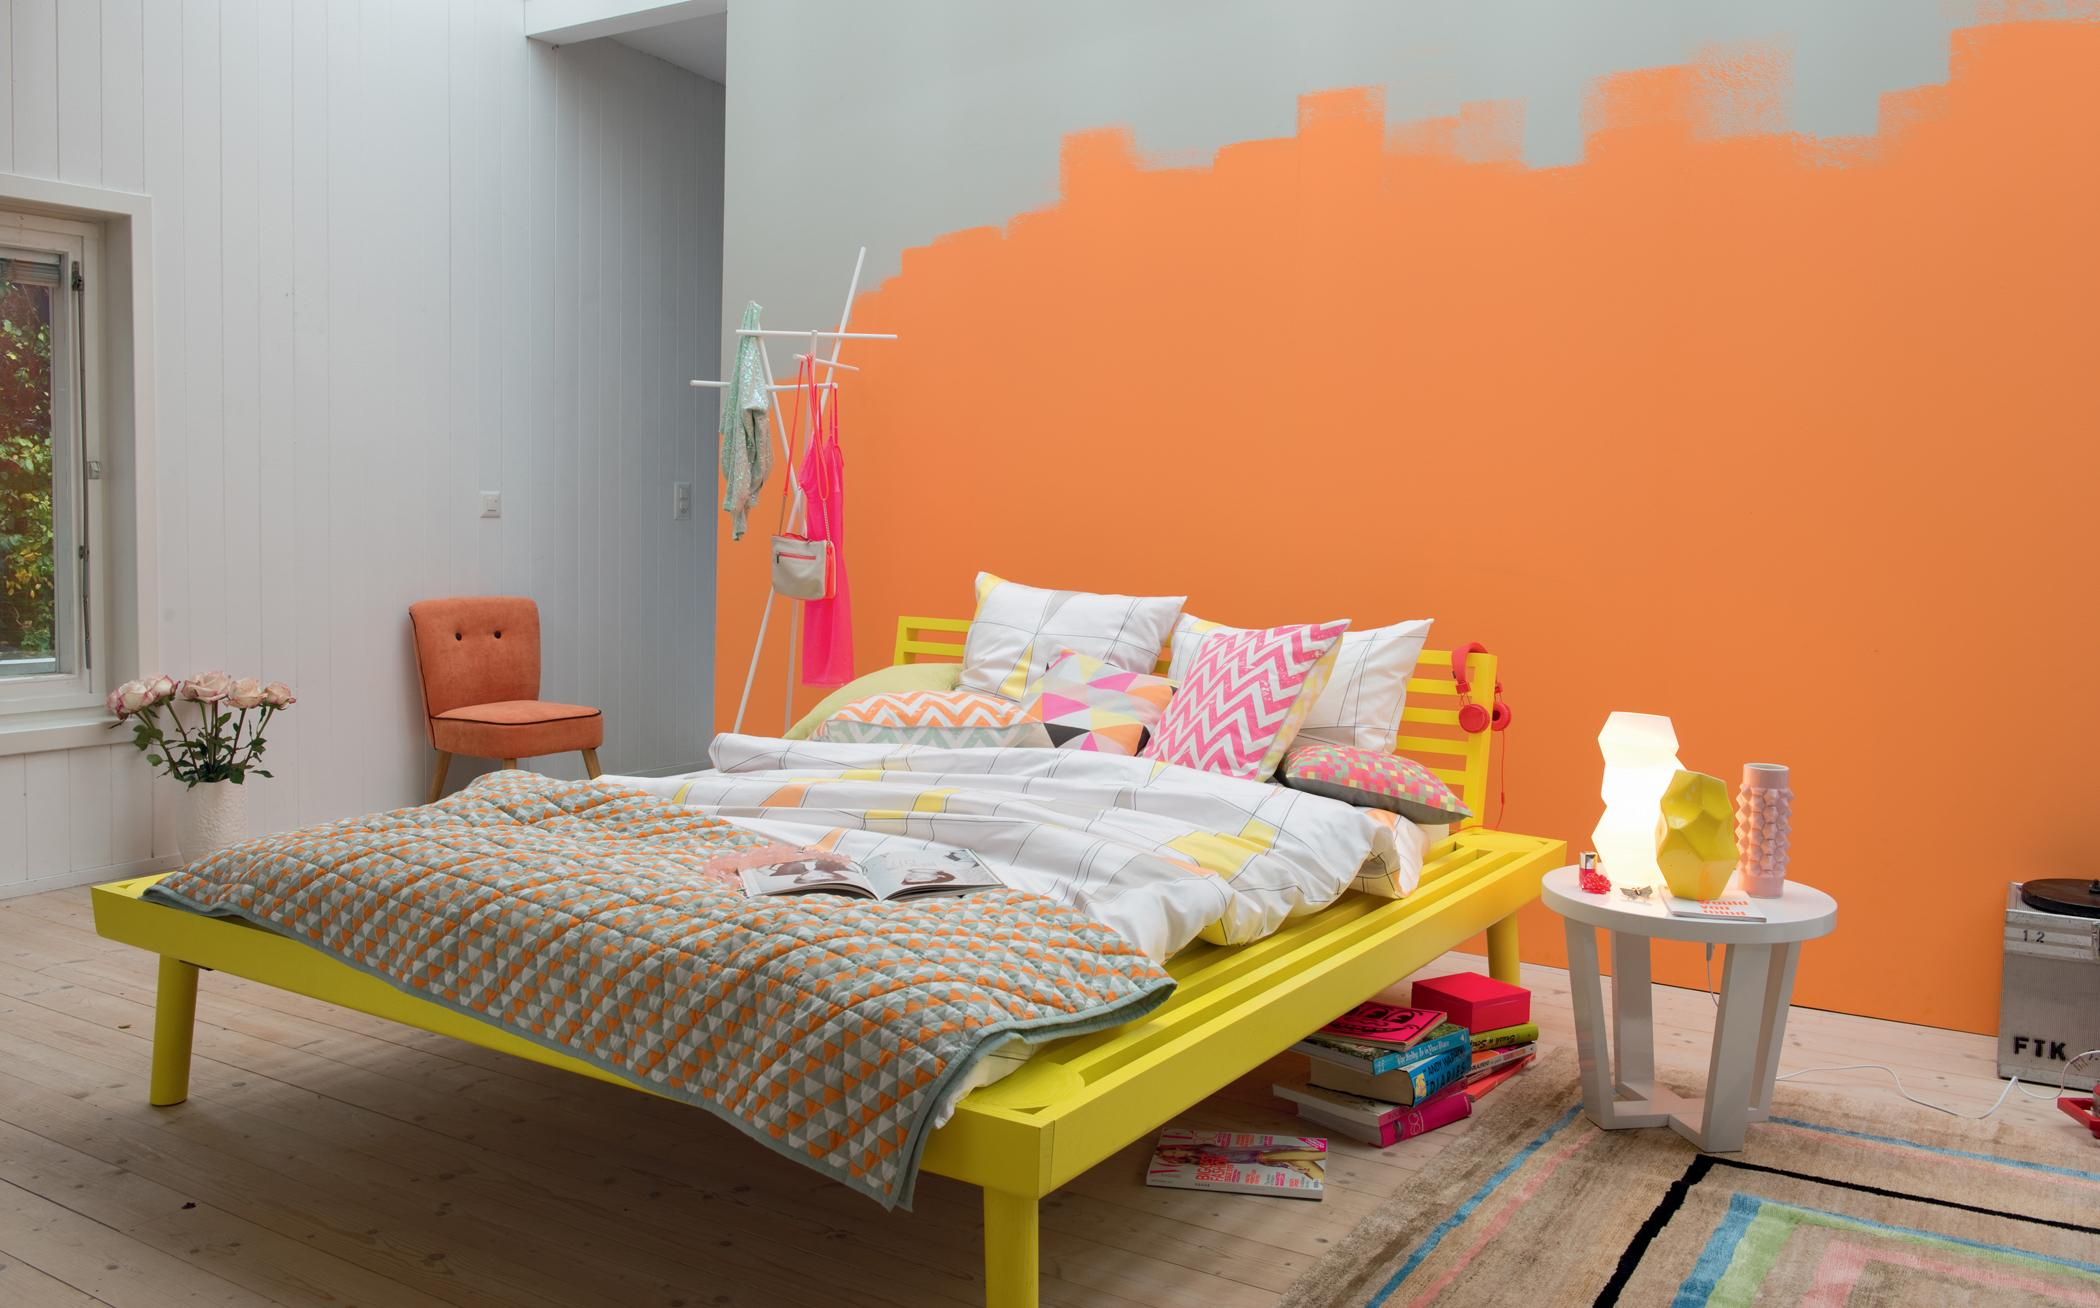 Graue Wandgestaltung • Bilder & Ideen • COUCH